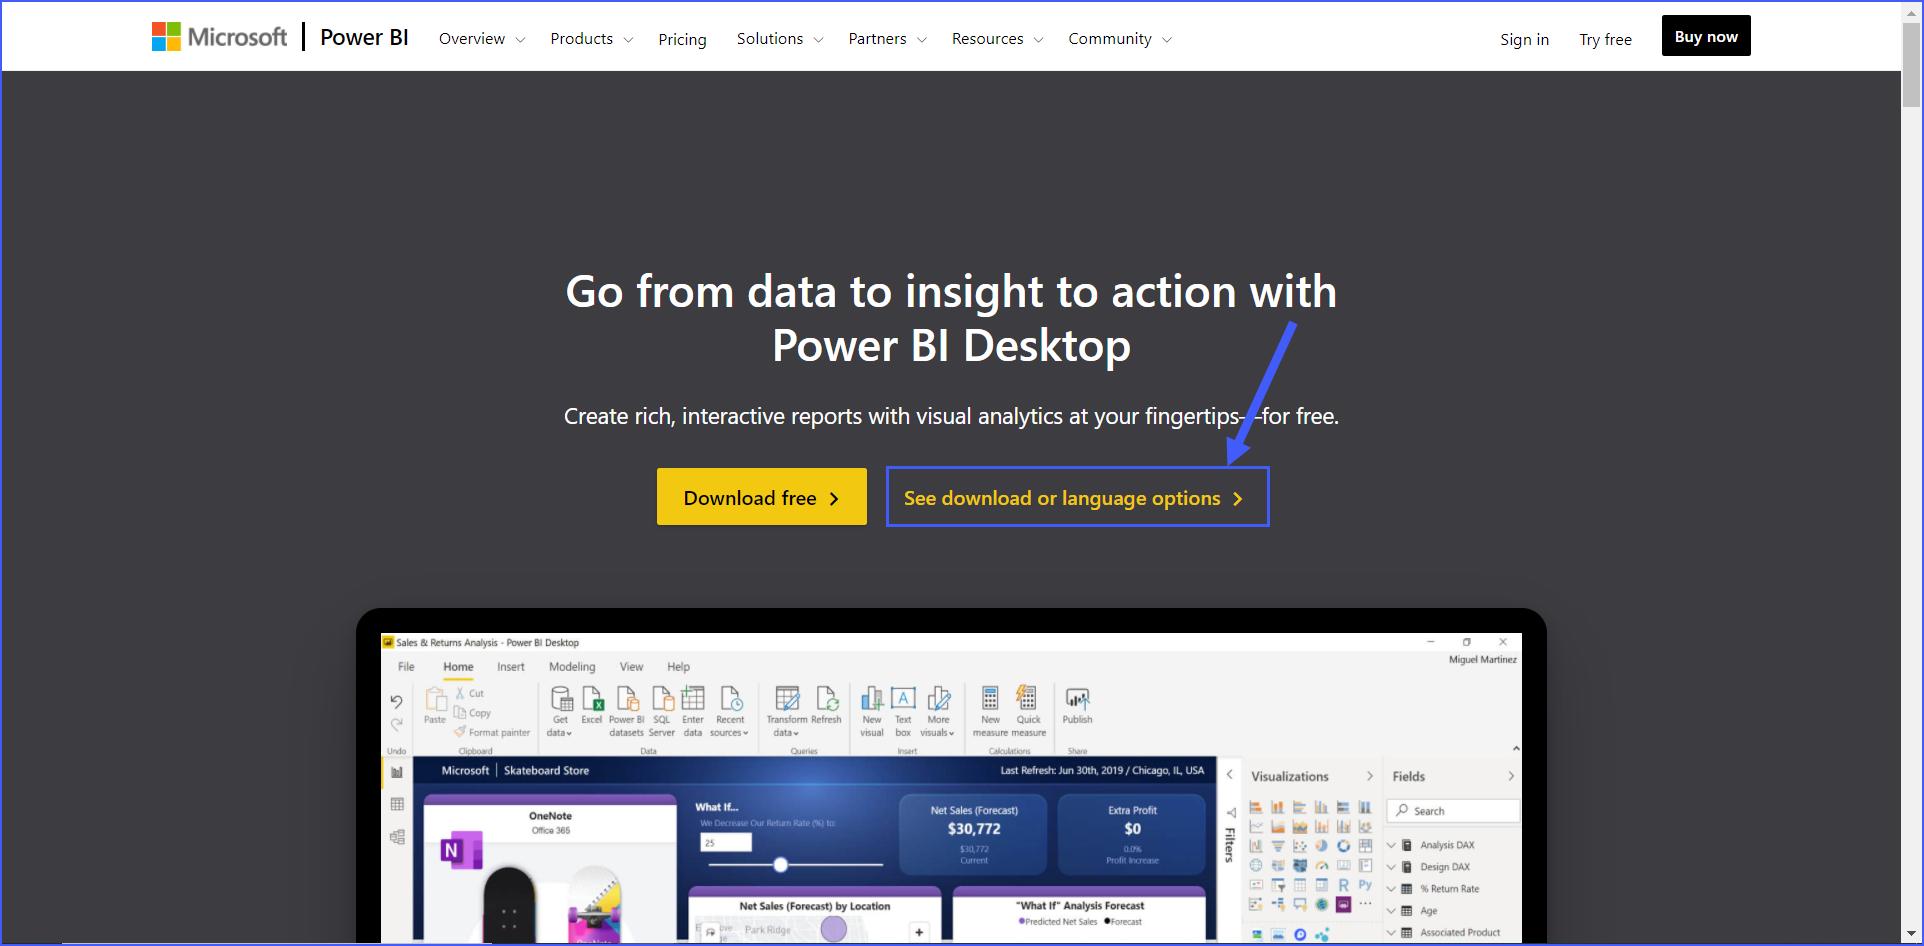 downloading options for power bi desktop application